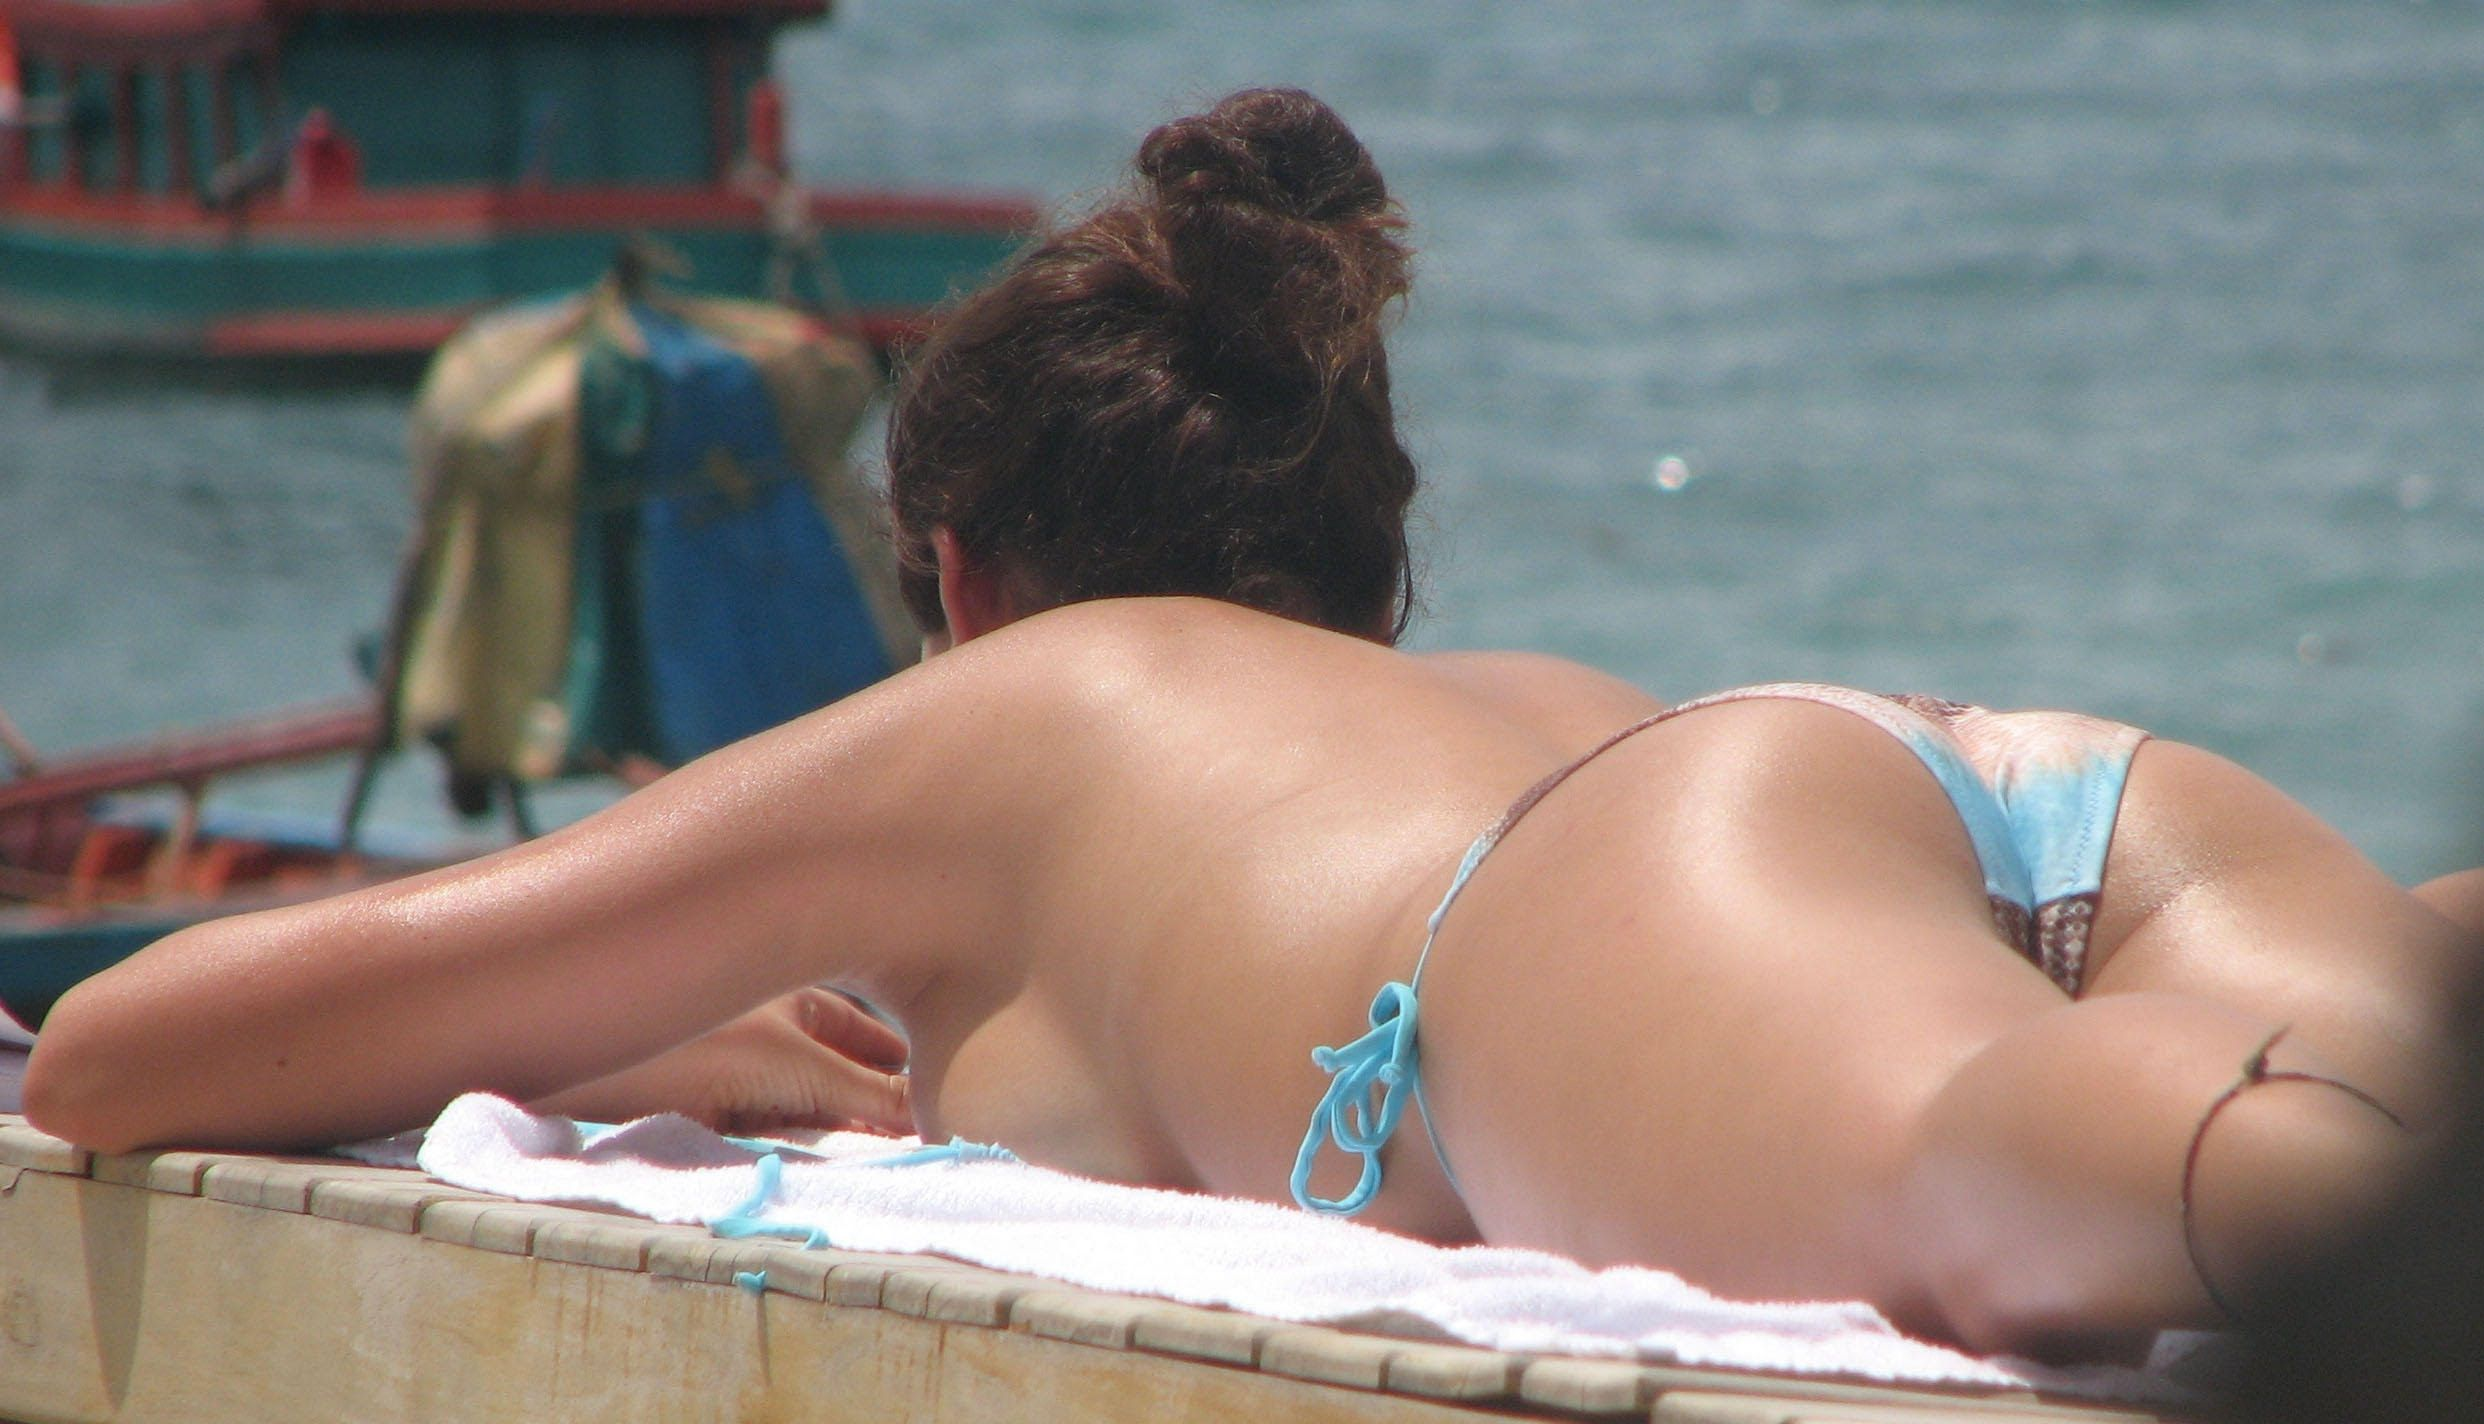 Tsgirlspeeinginpublic inspirational nude turkey beaches naked